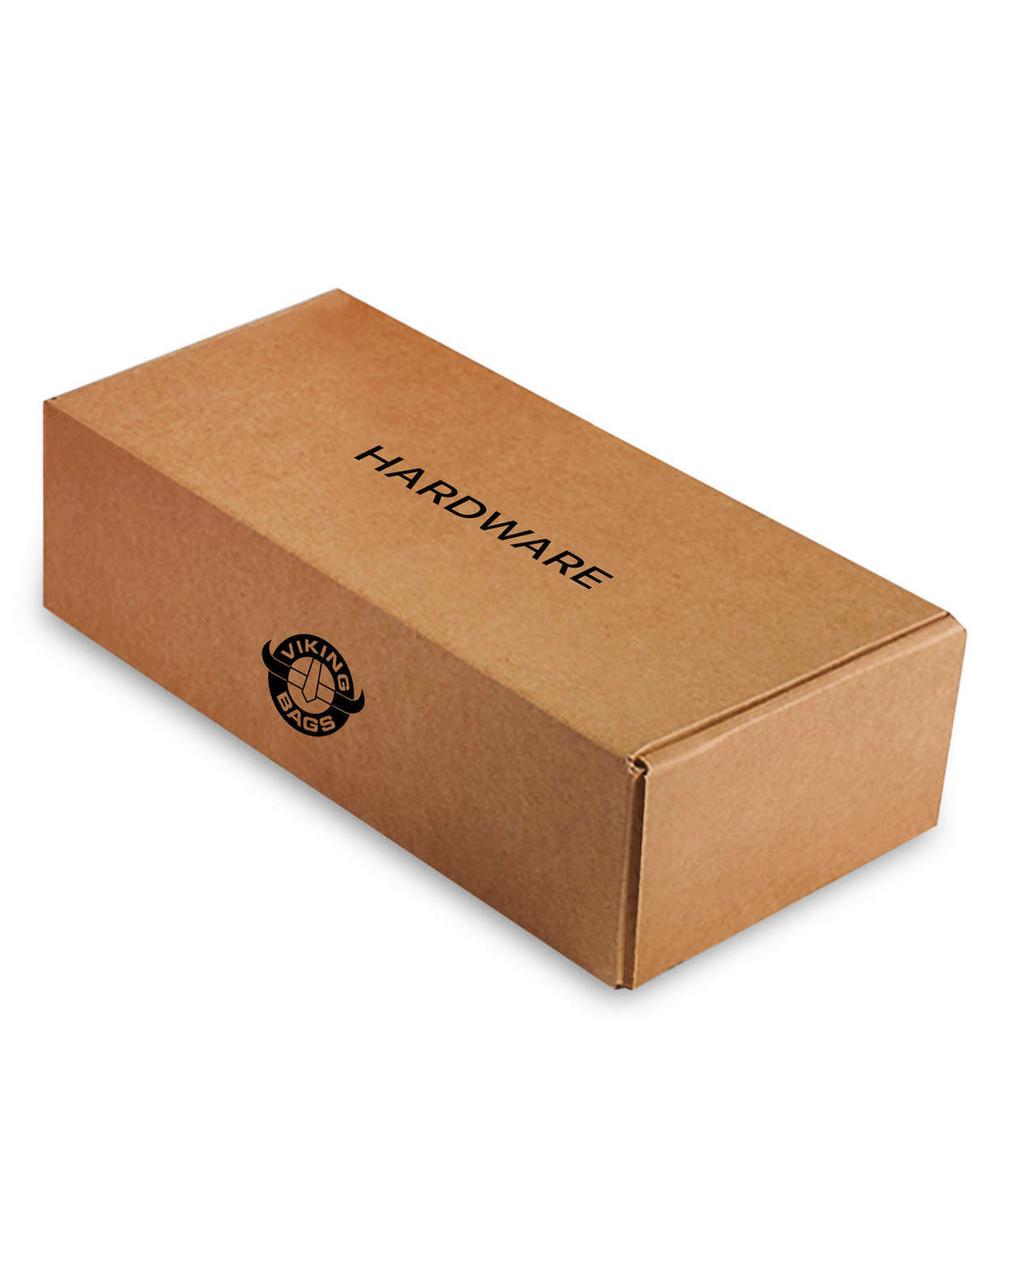 Honda VTX 1300 C Viking Raven Medium Leather Motorcycle Saddlebags Hardware Box